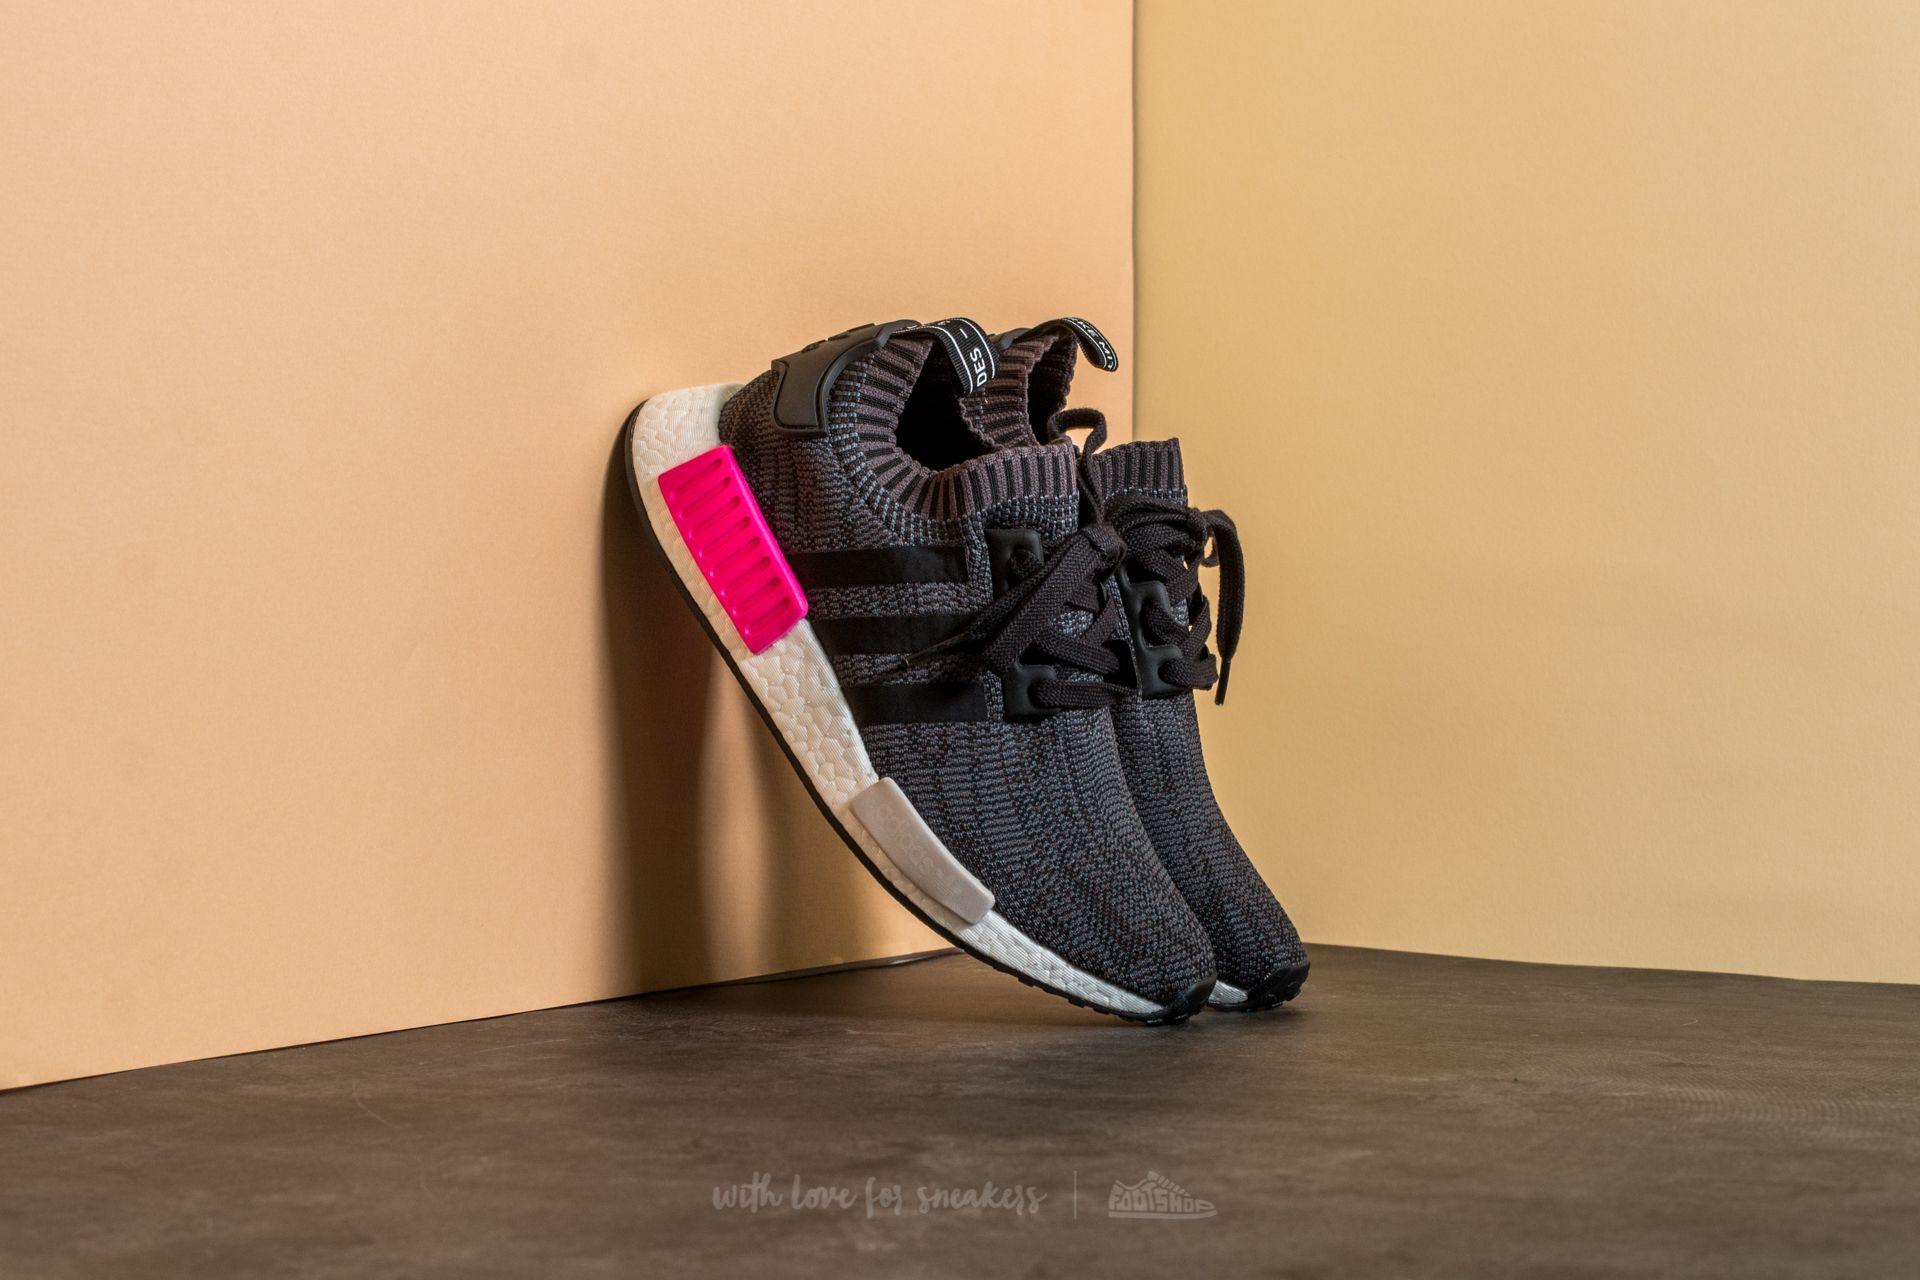 d21a9760bce7c adidas NMD R1 W Primeknit Core Black  Shock Pink